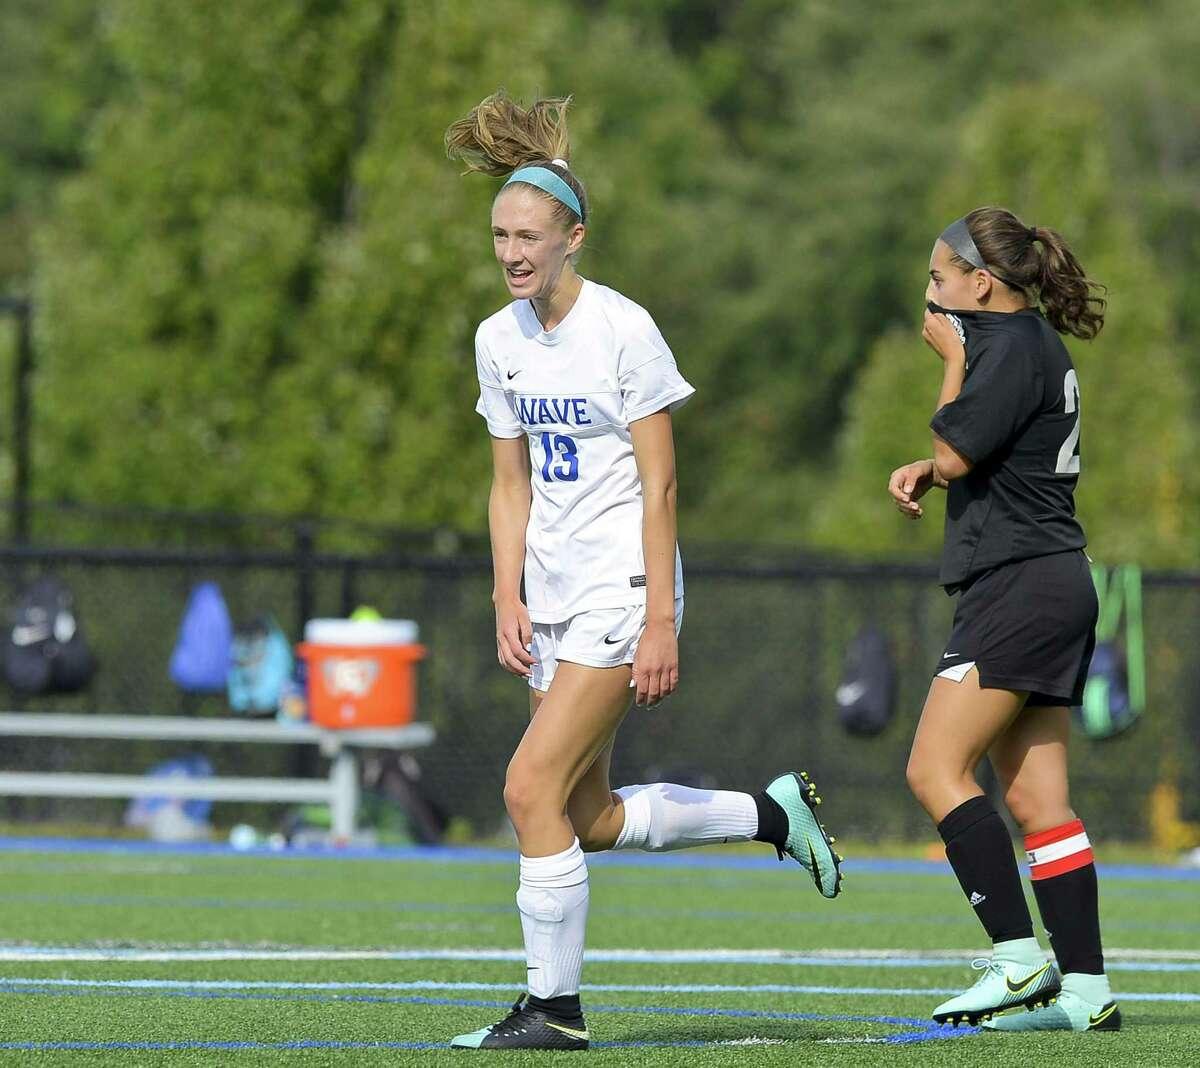 Darien Ellen Harnisch (13) celebrates her first half goal against Trumbull in a FCIAC varsity girls soccer game on Tuesday, Sept. 12, 2017 in Darein, Connecticut. Darien defeated Trumbull 1-0.